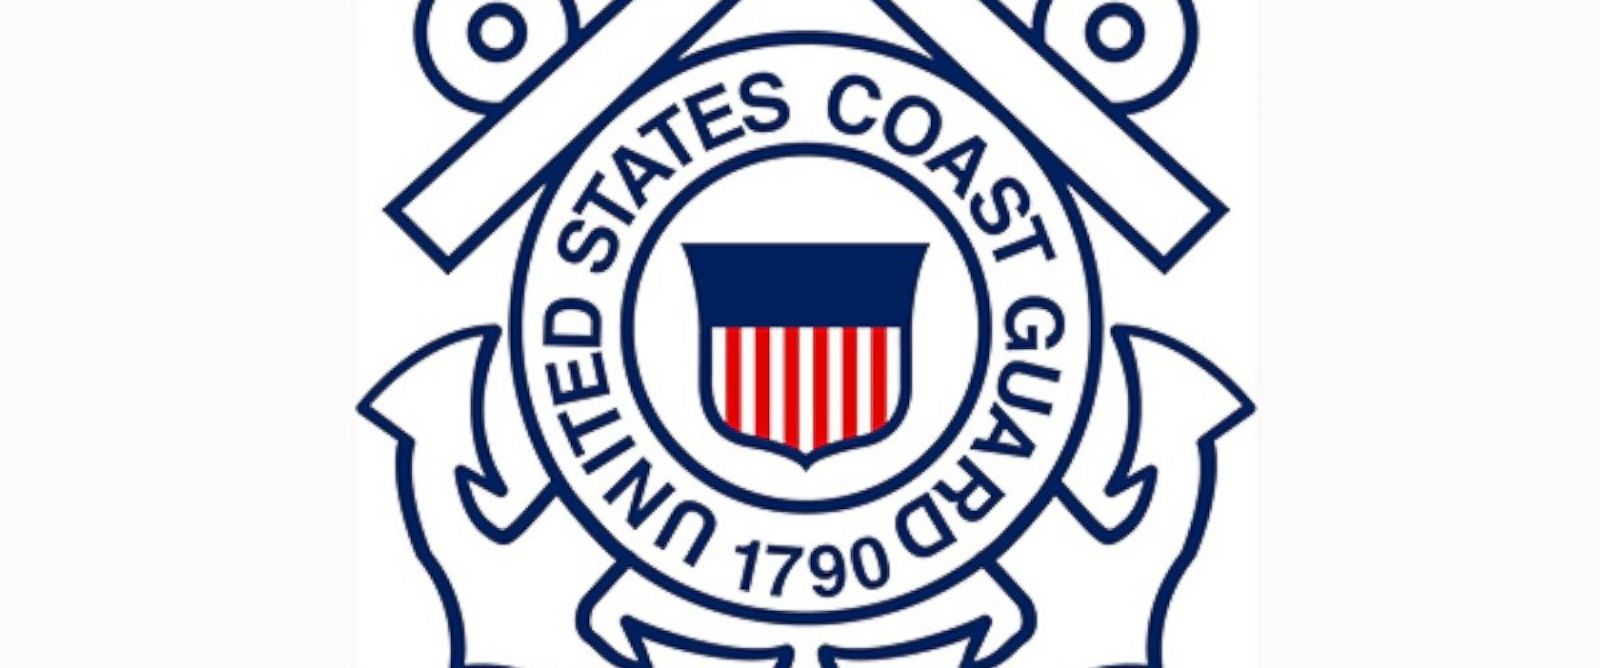 PHOTO: National Coast Guard Emblem